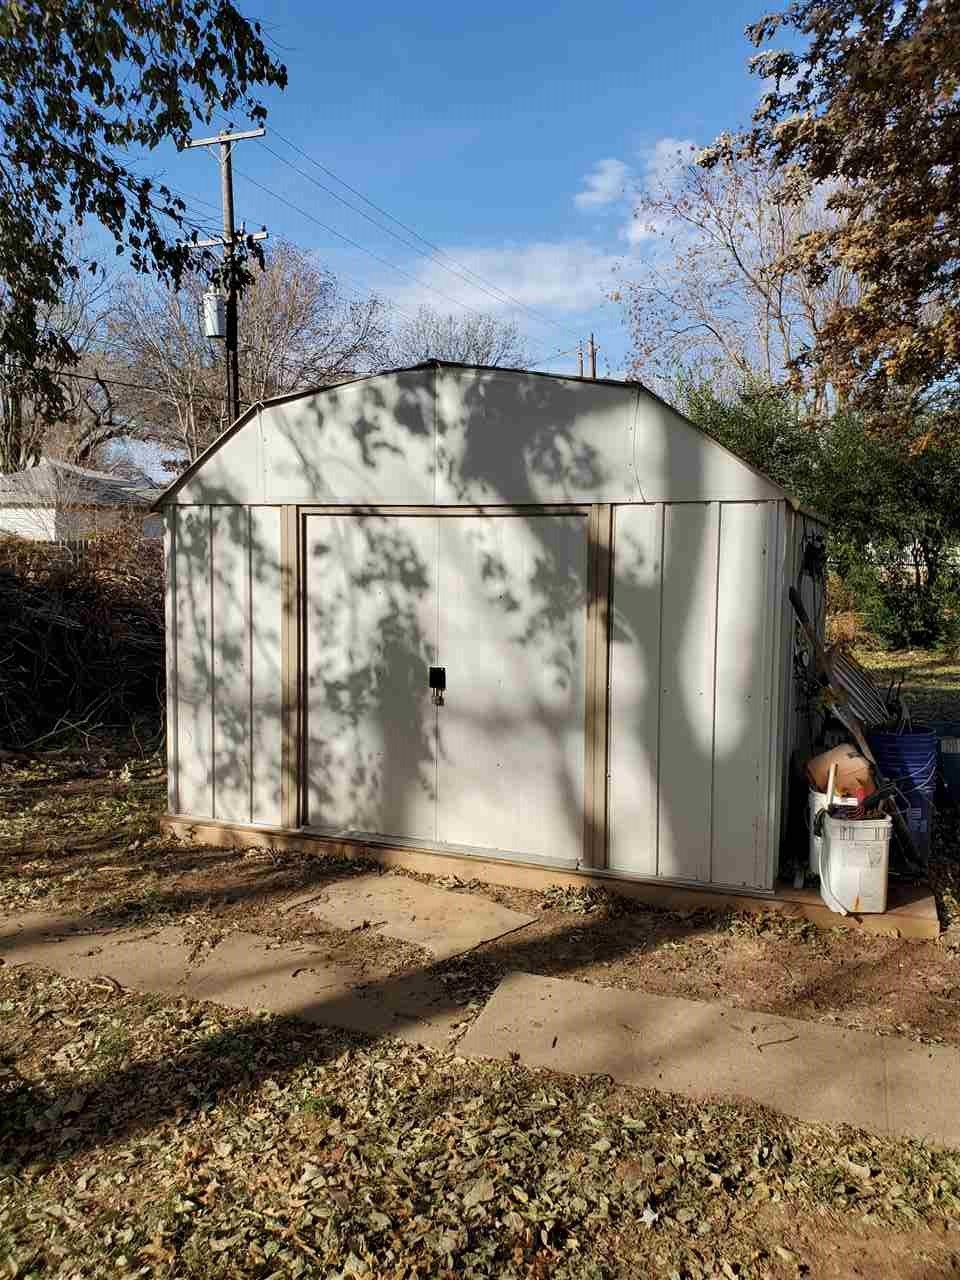 #century21groupone,#homesforsaleponcacity,#poncacityrealestate | 1106 S 7th Street  Ponca City, OK 74601-0 5